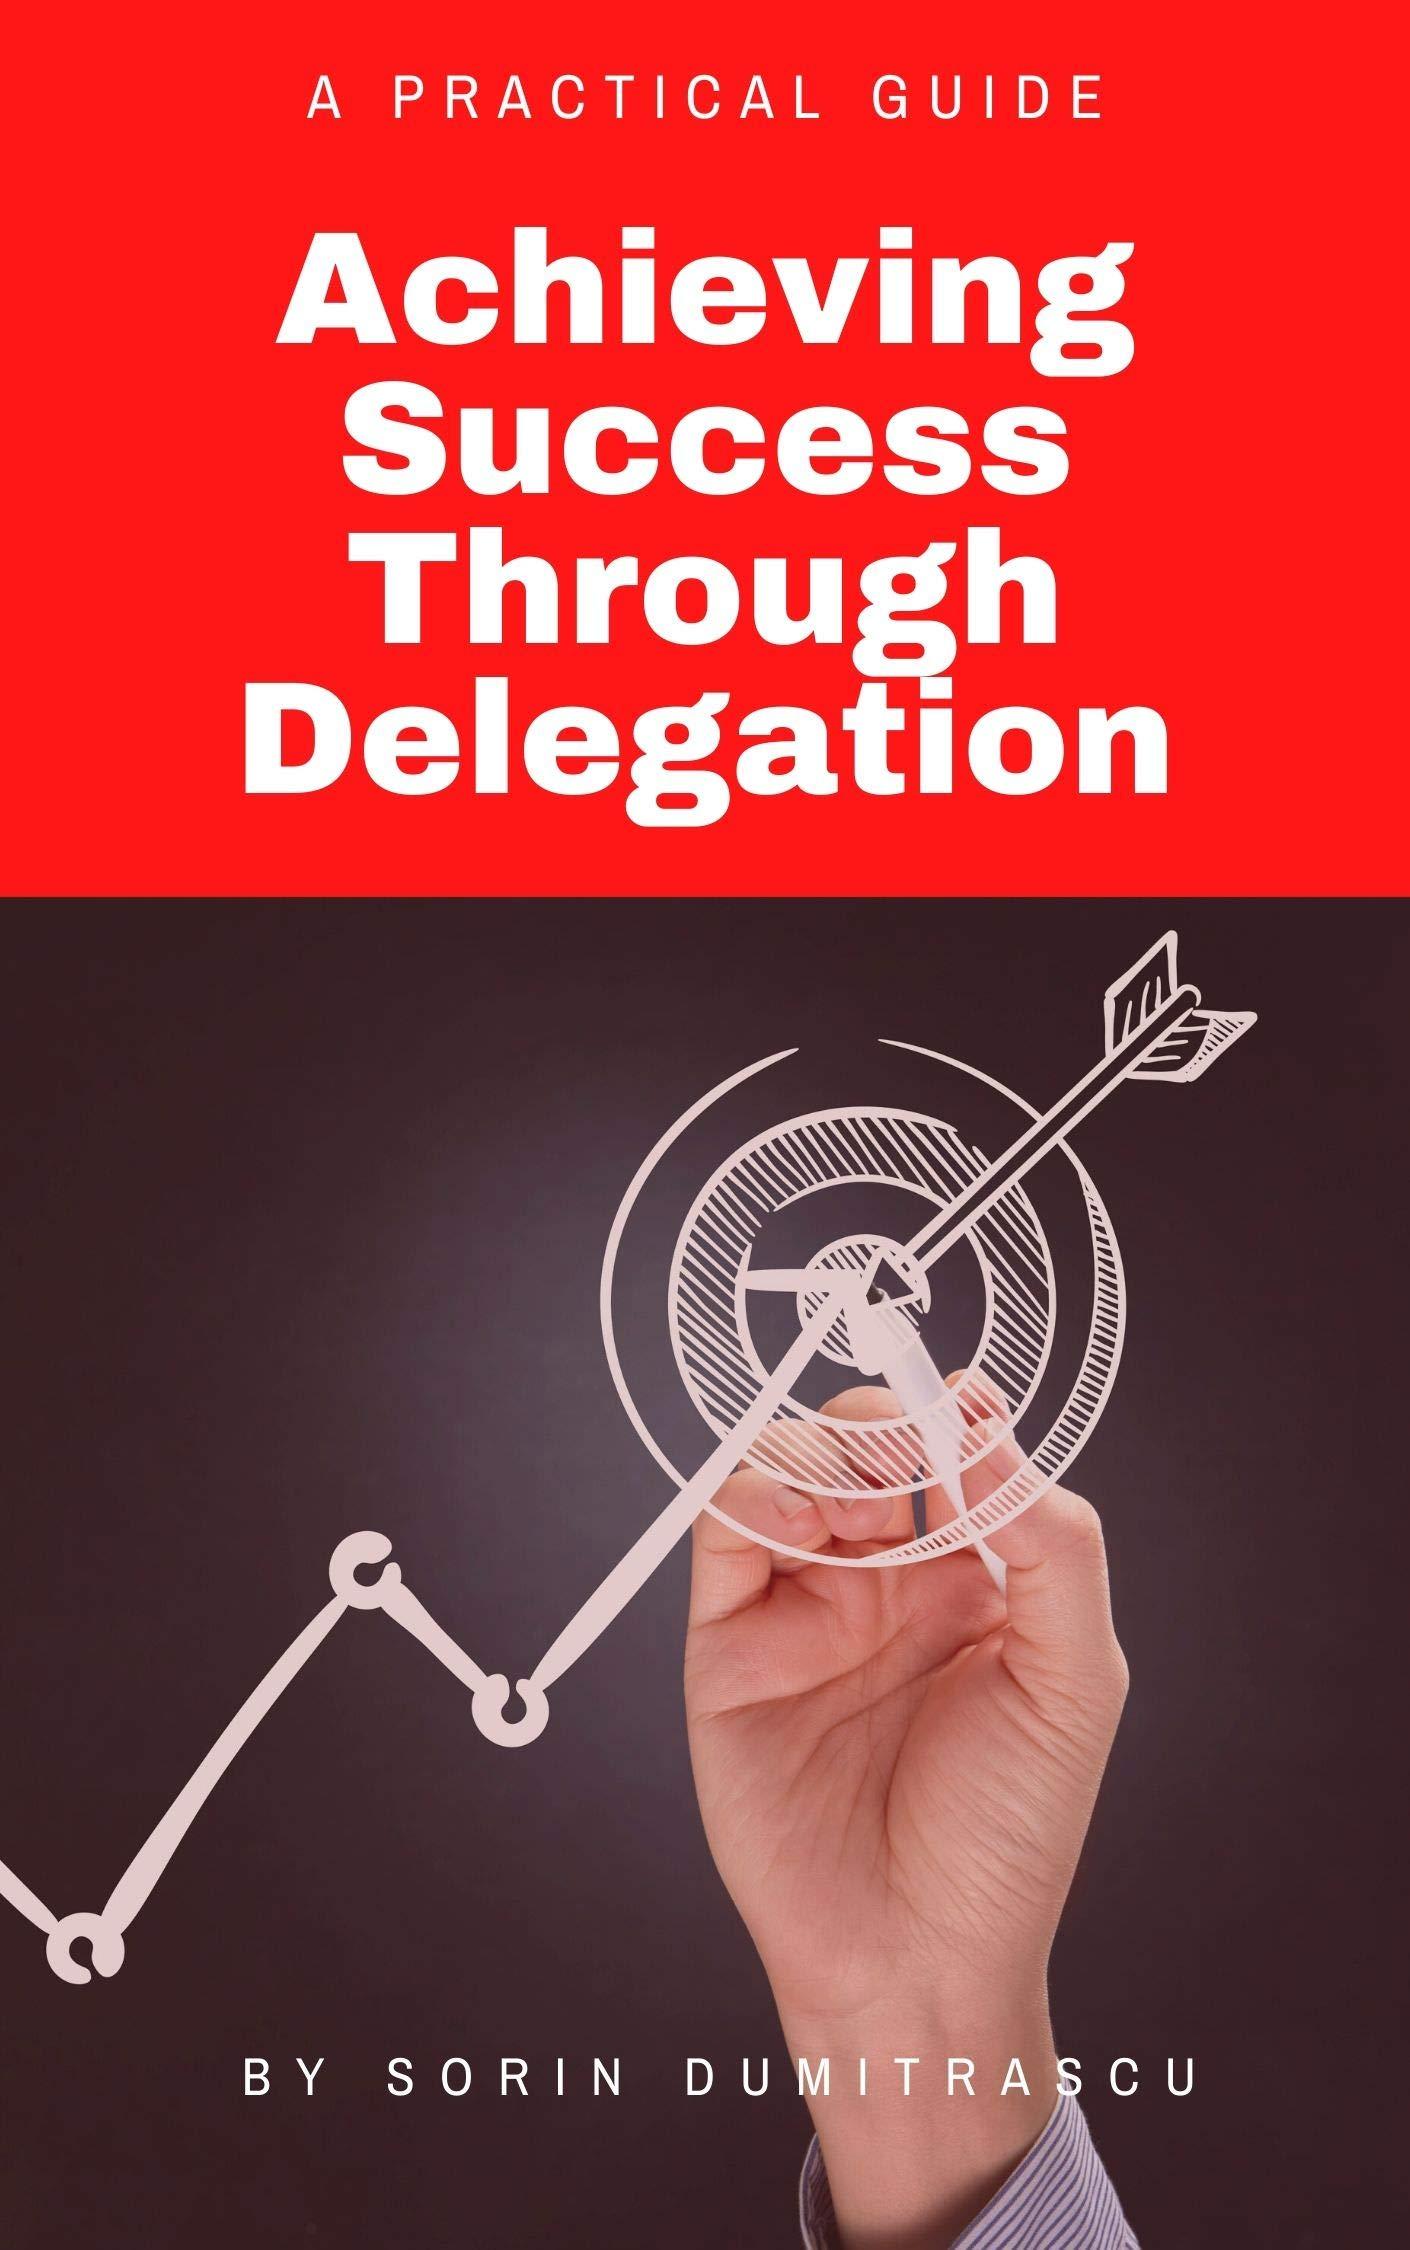 Achieving Success Through Delegation: A Practical Guide